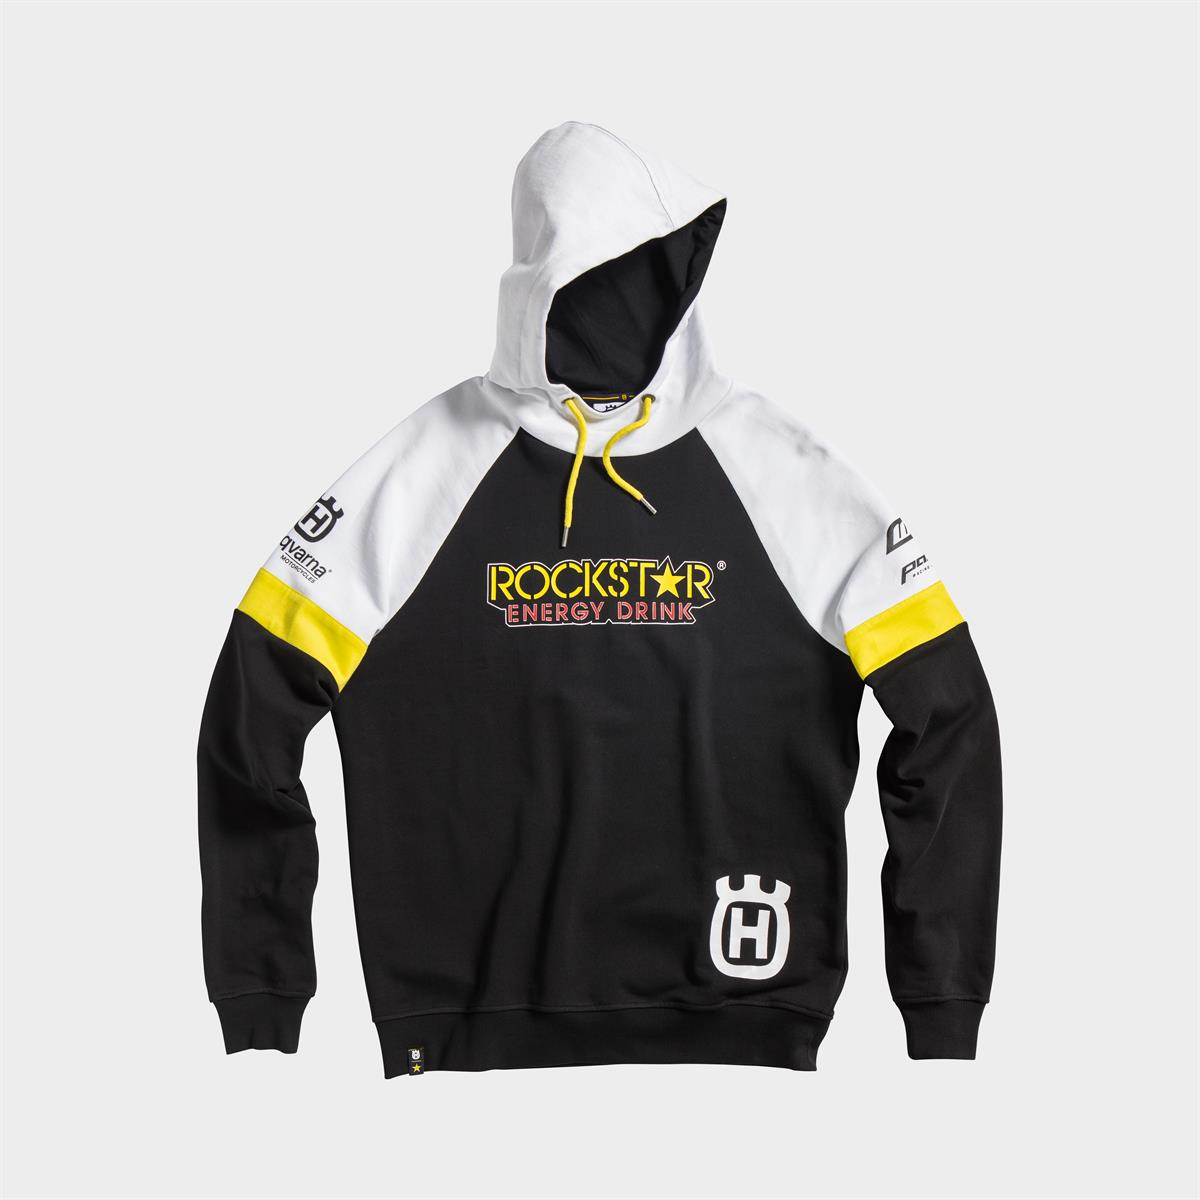 Rockstar Energy Husqvarna Factory Racing Replica Collection Team Hoodie